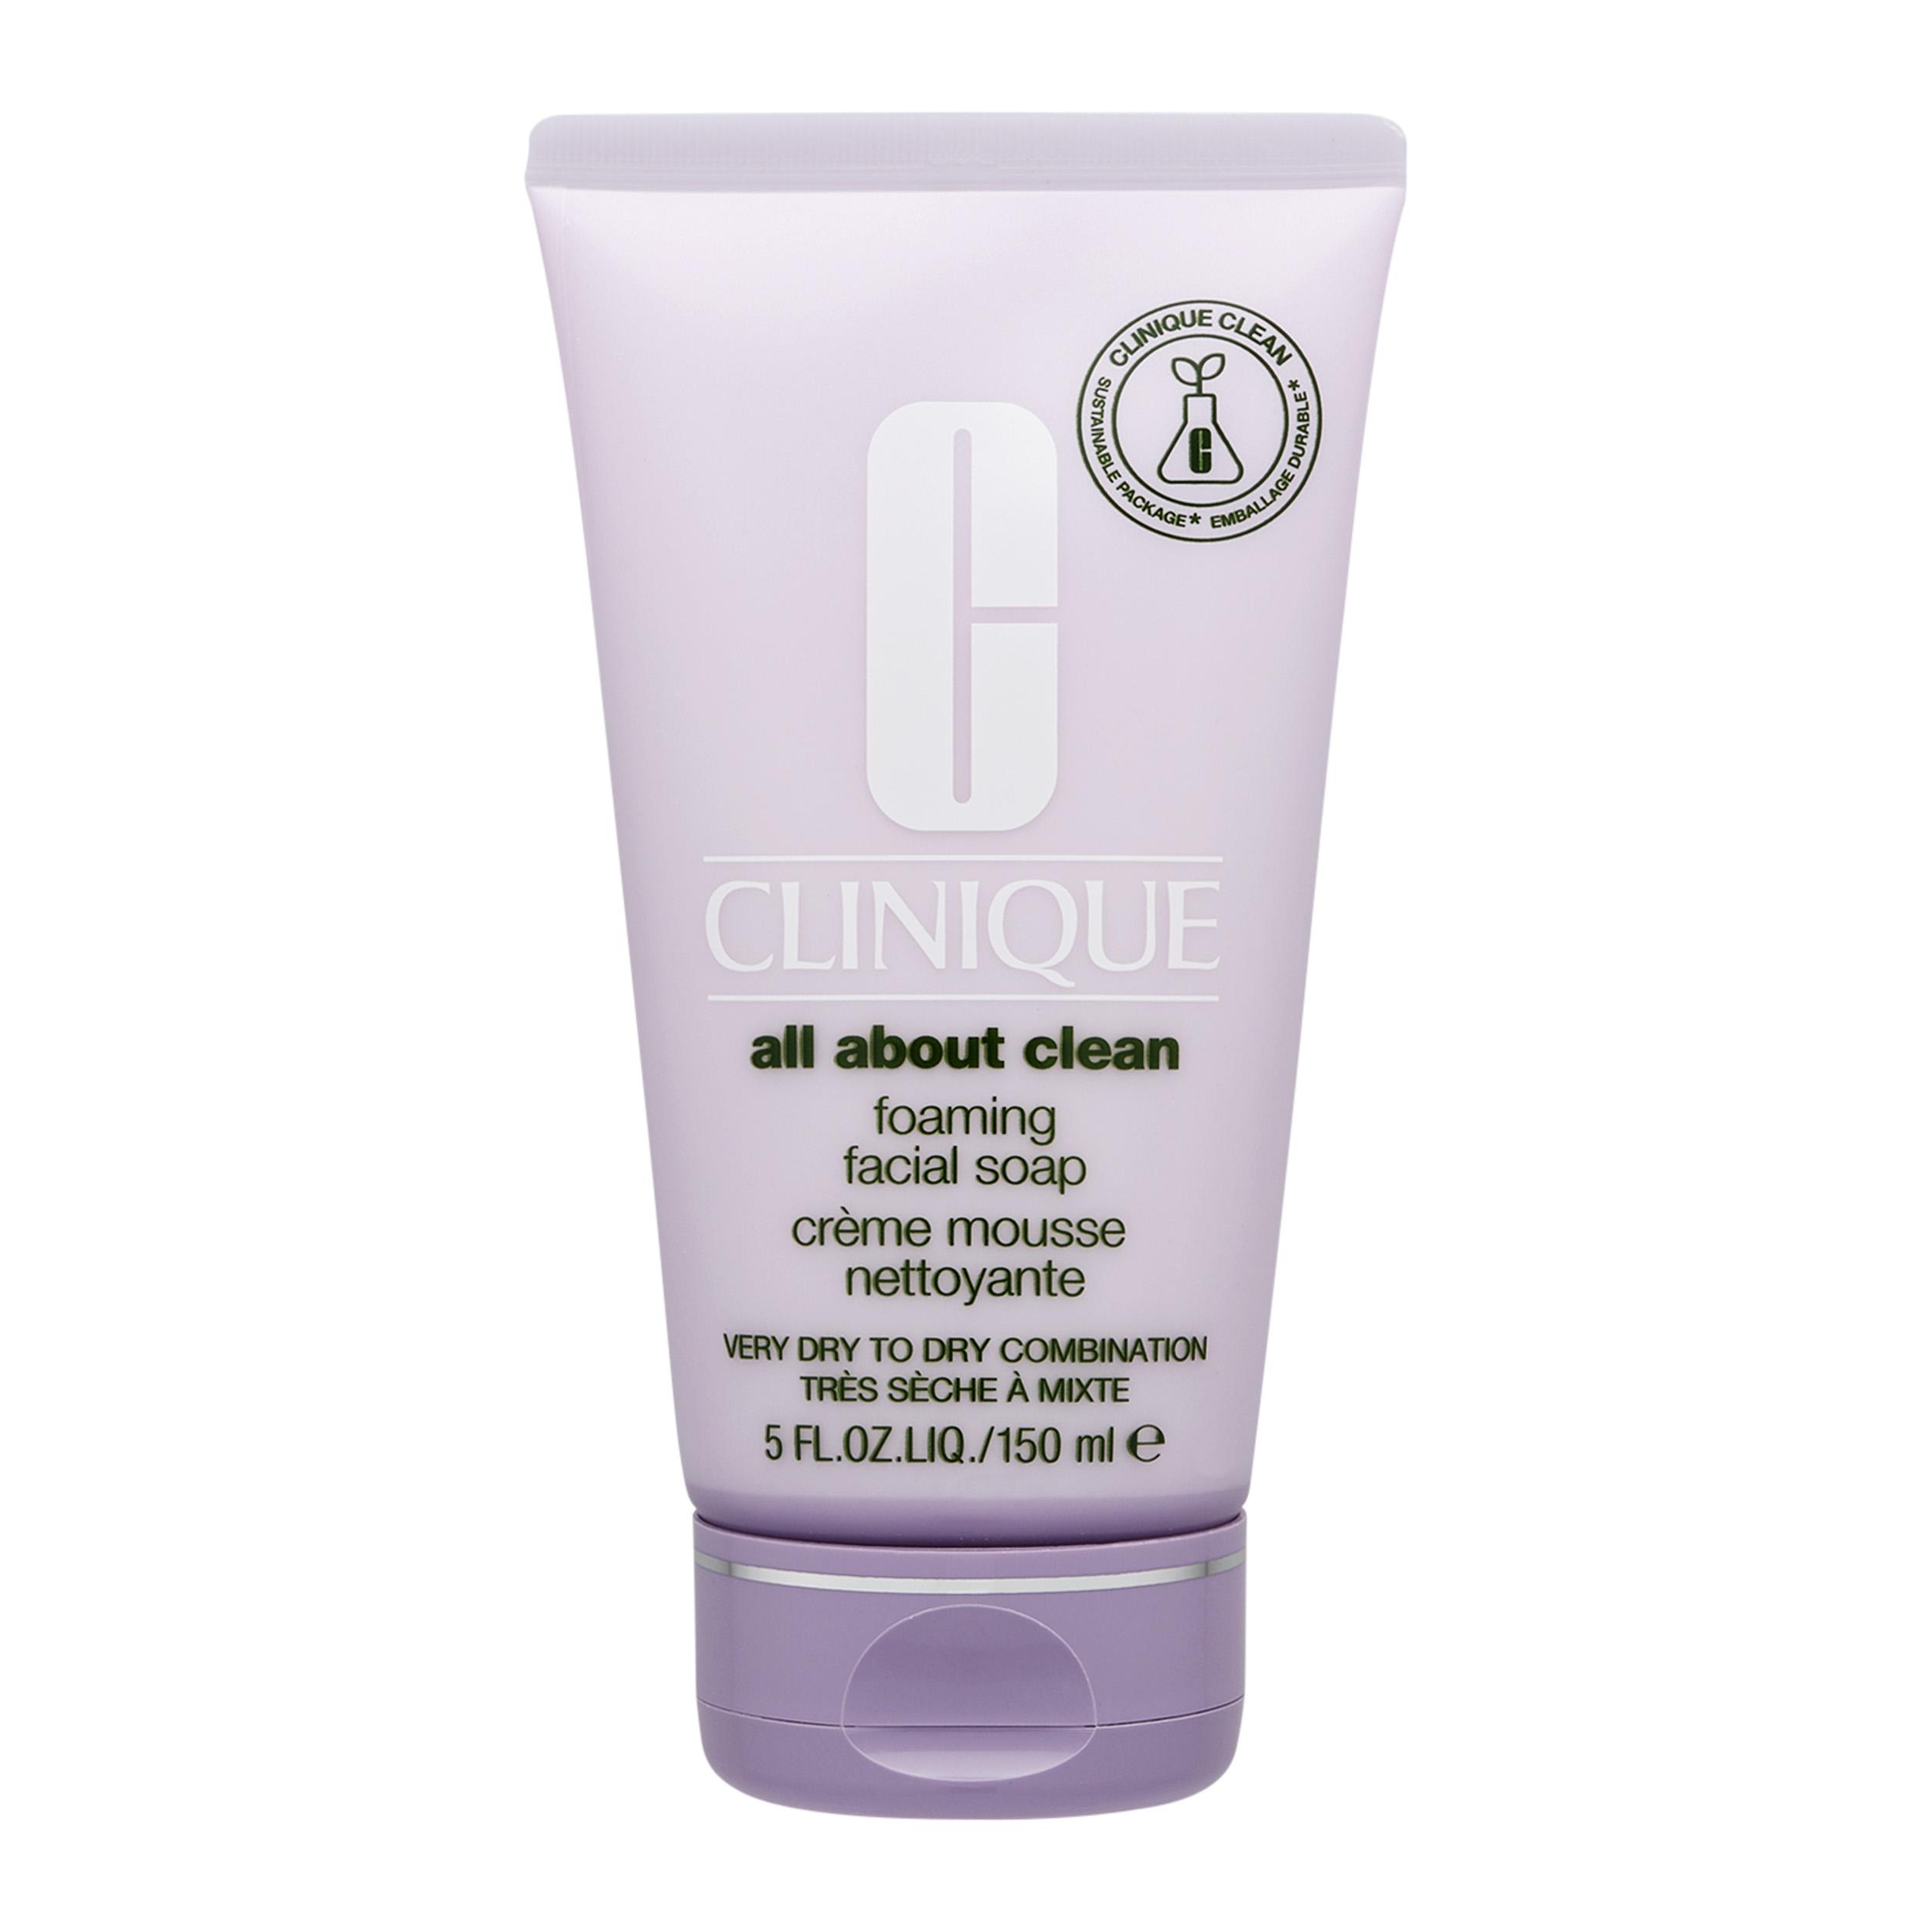 Clinique  Foaming Sonic Facial Soap 5oz, 150ml from Cosme-De.com